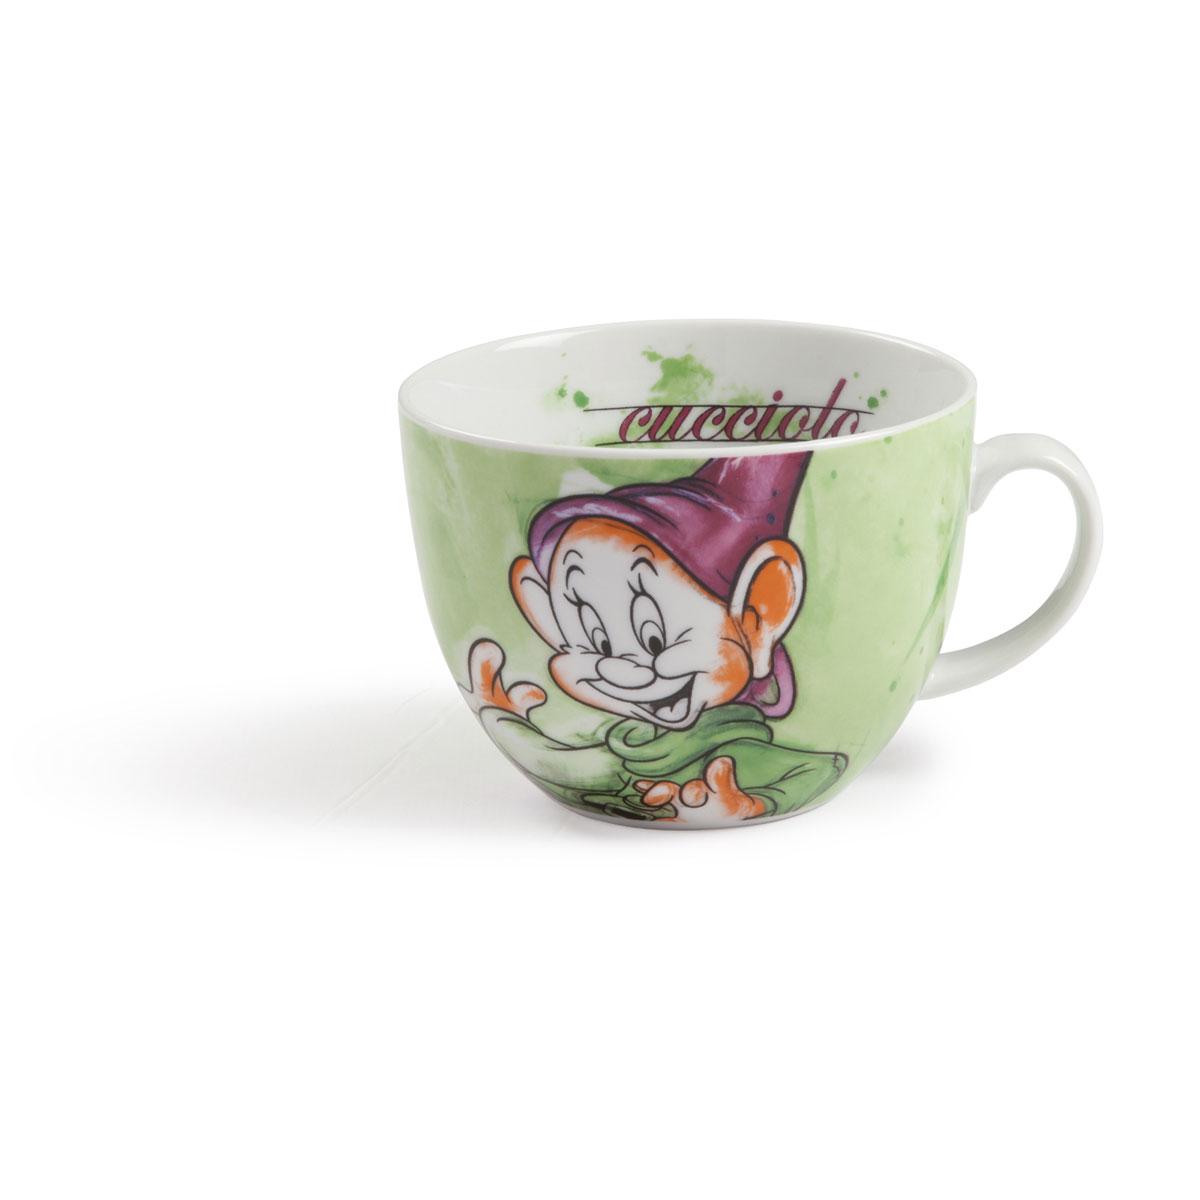 Cappuccino Cup Dopey 7 Dwarfs - Disney Home